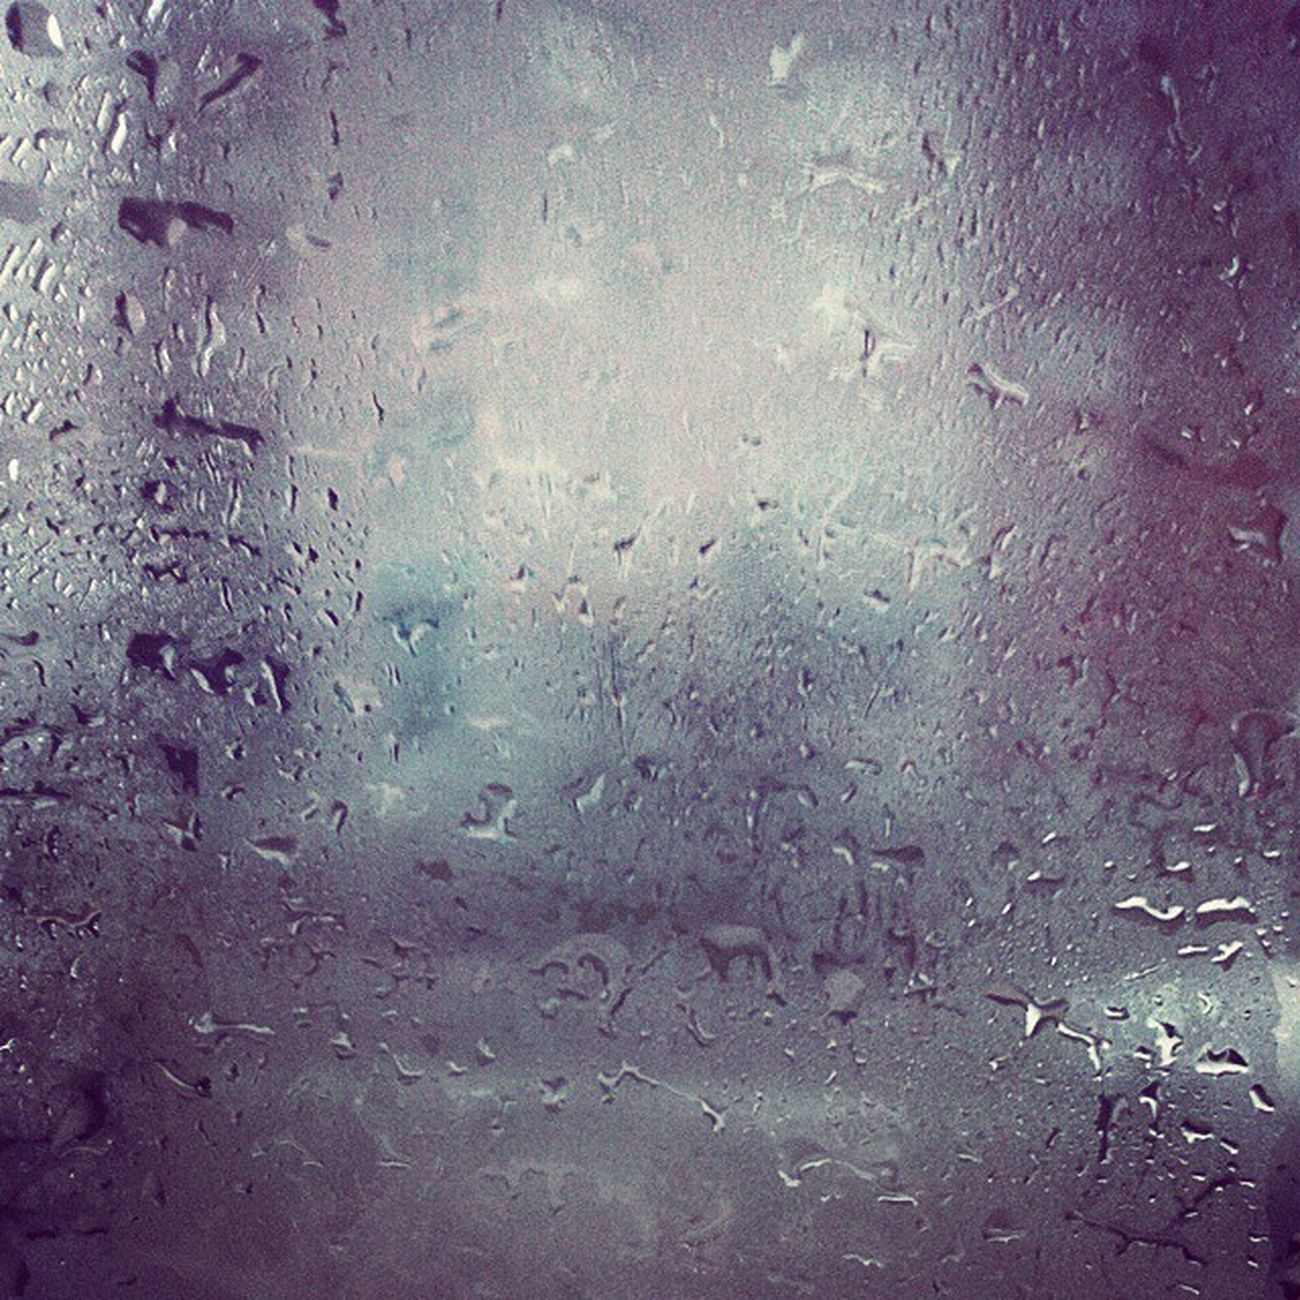 Слезы стекла. омск осень Tears of glass Autumn Tearsofglass